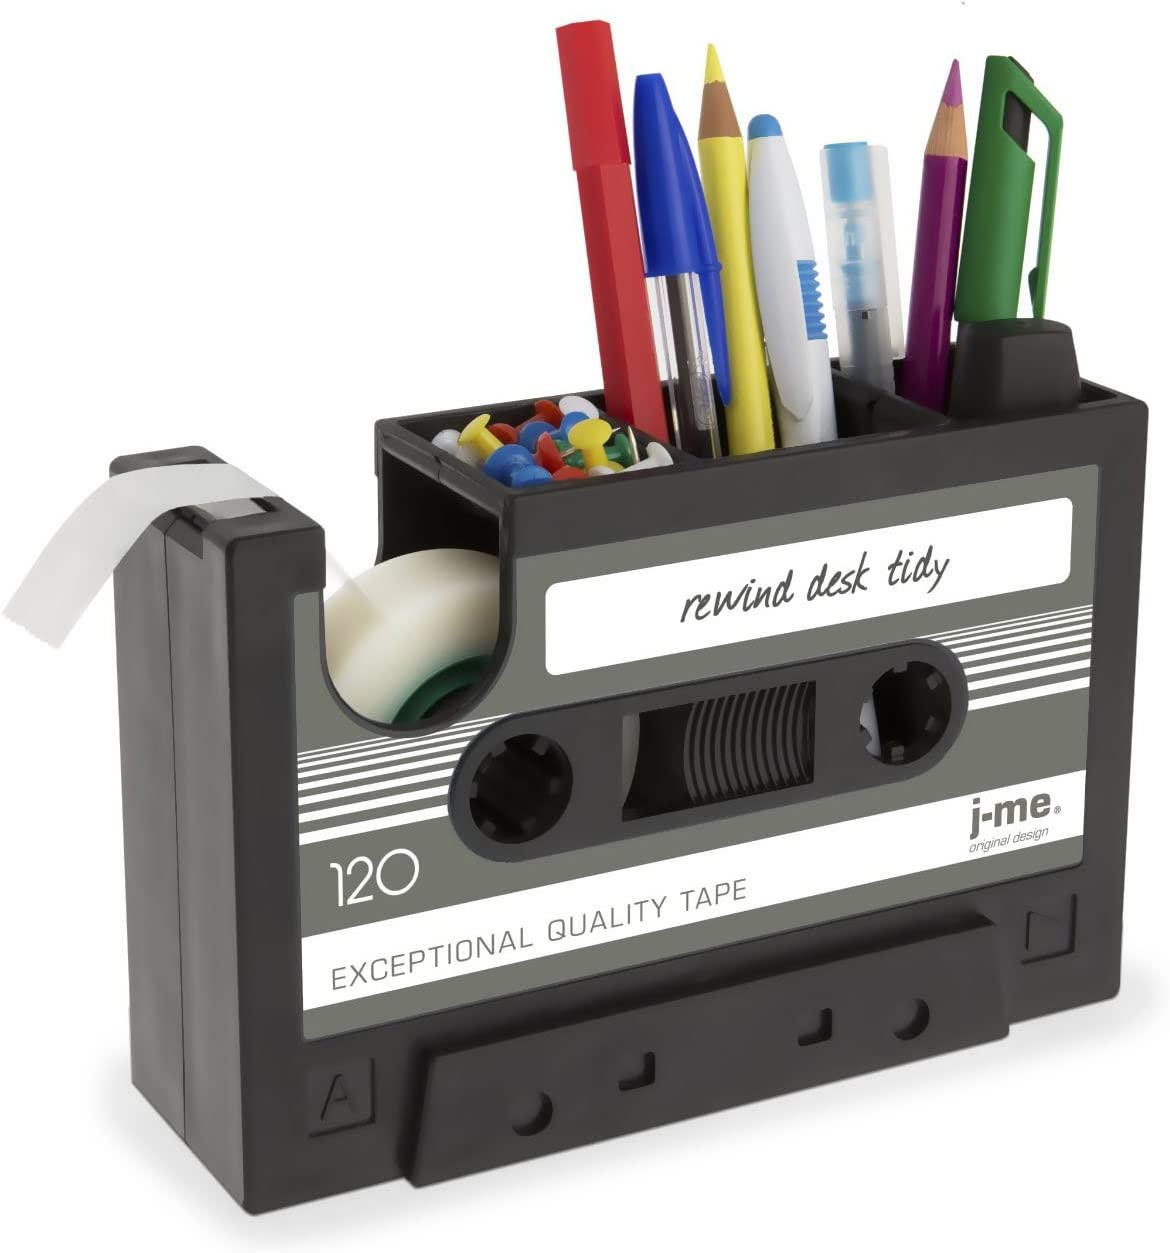 Quality inspection Cassette Tape Dispenser Pen Holder Pot De Pencil Stationery Quality inspection Vase